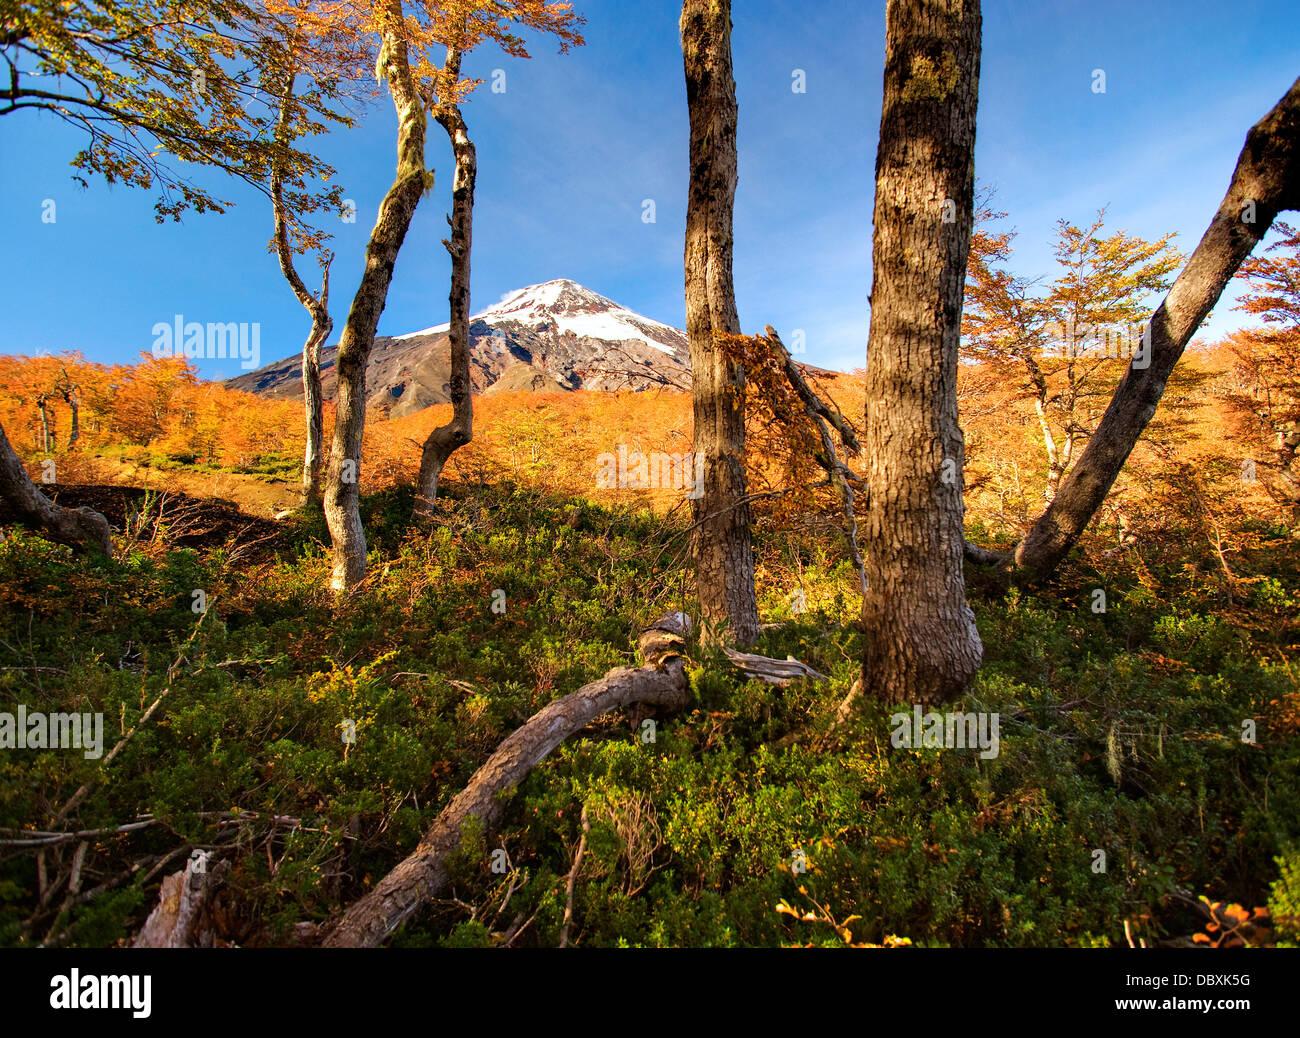 La zona de esquí de Pucón, Chile Imagen De Stock